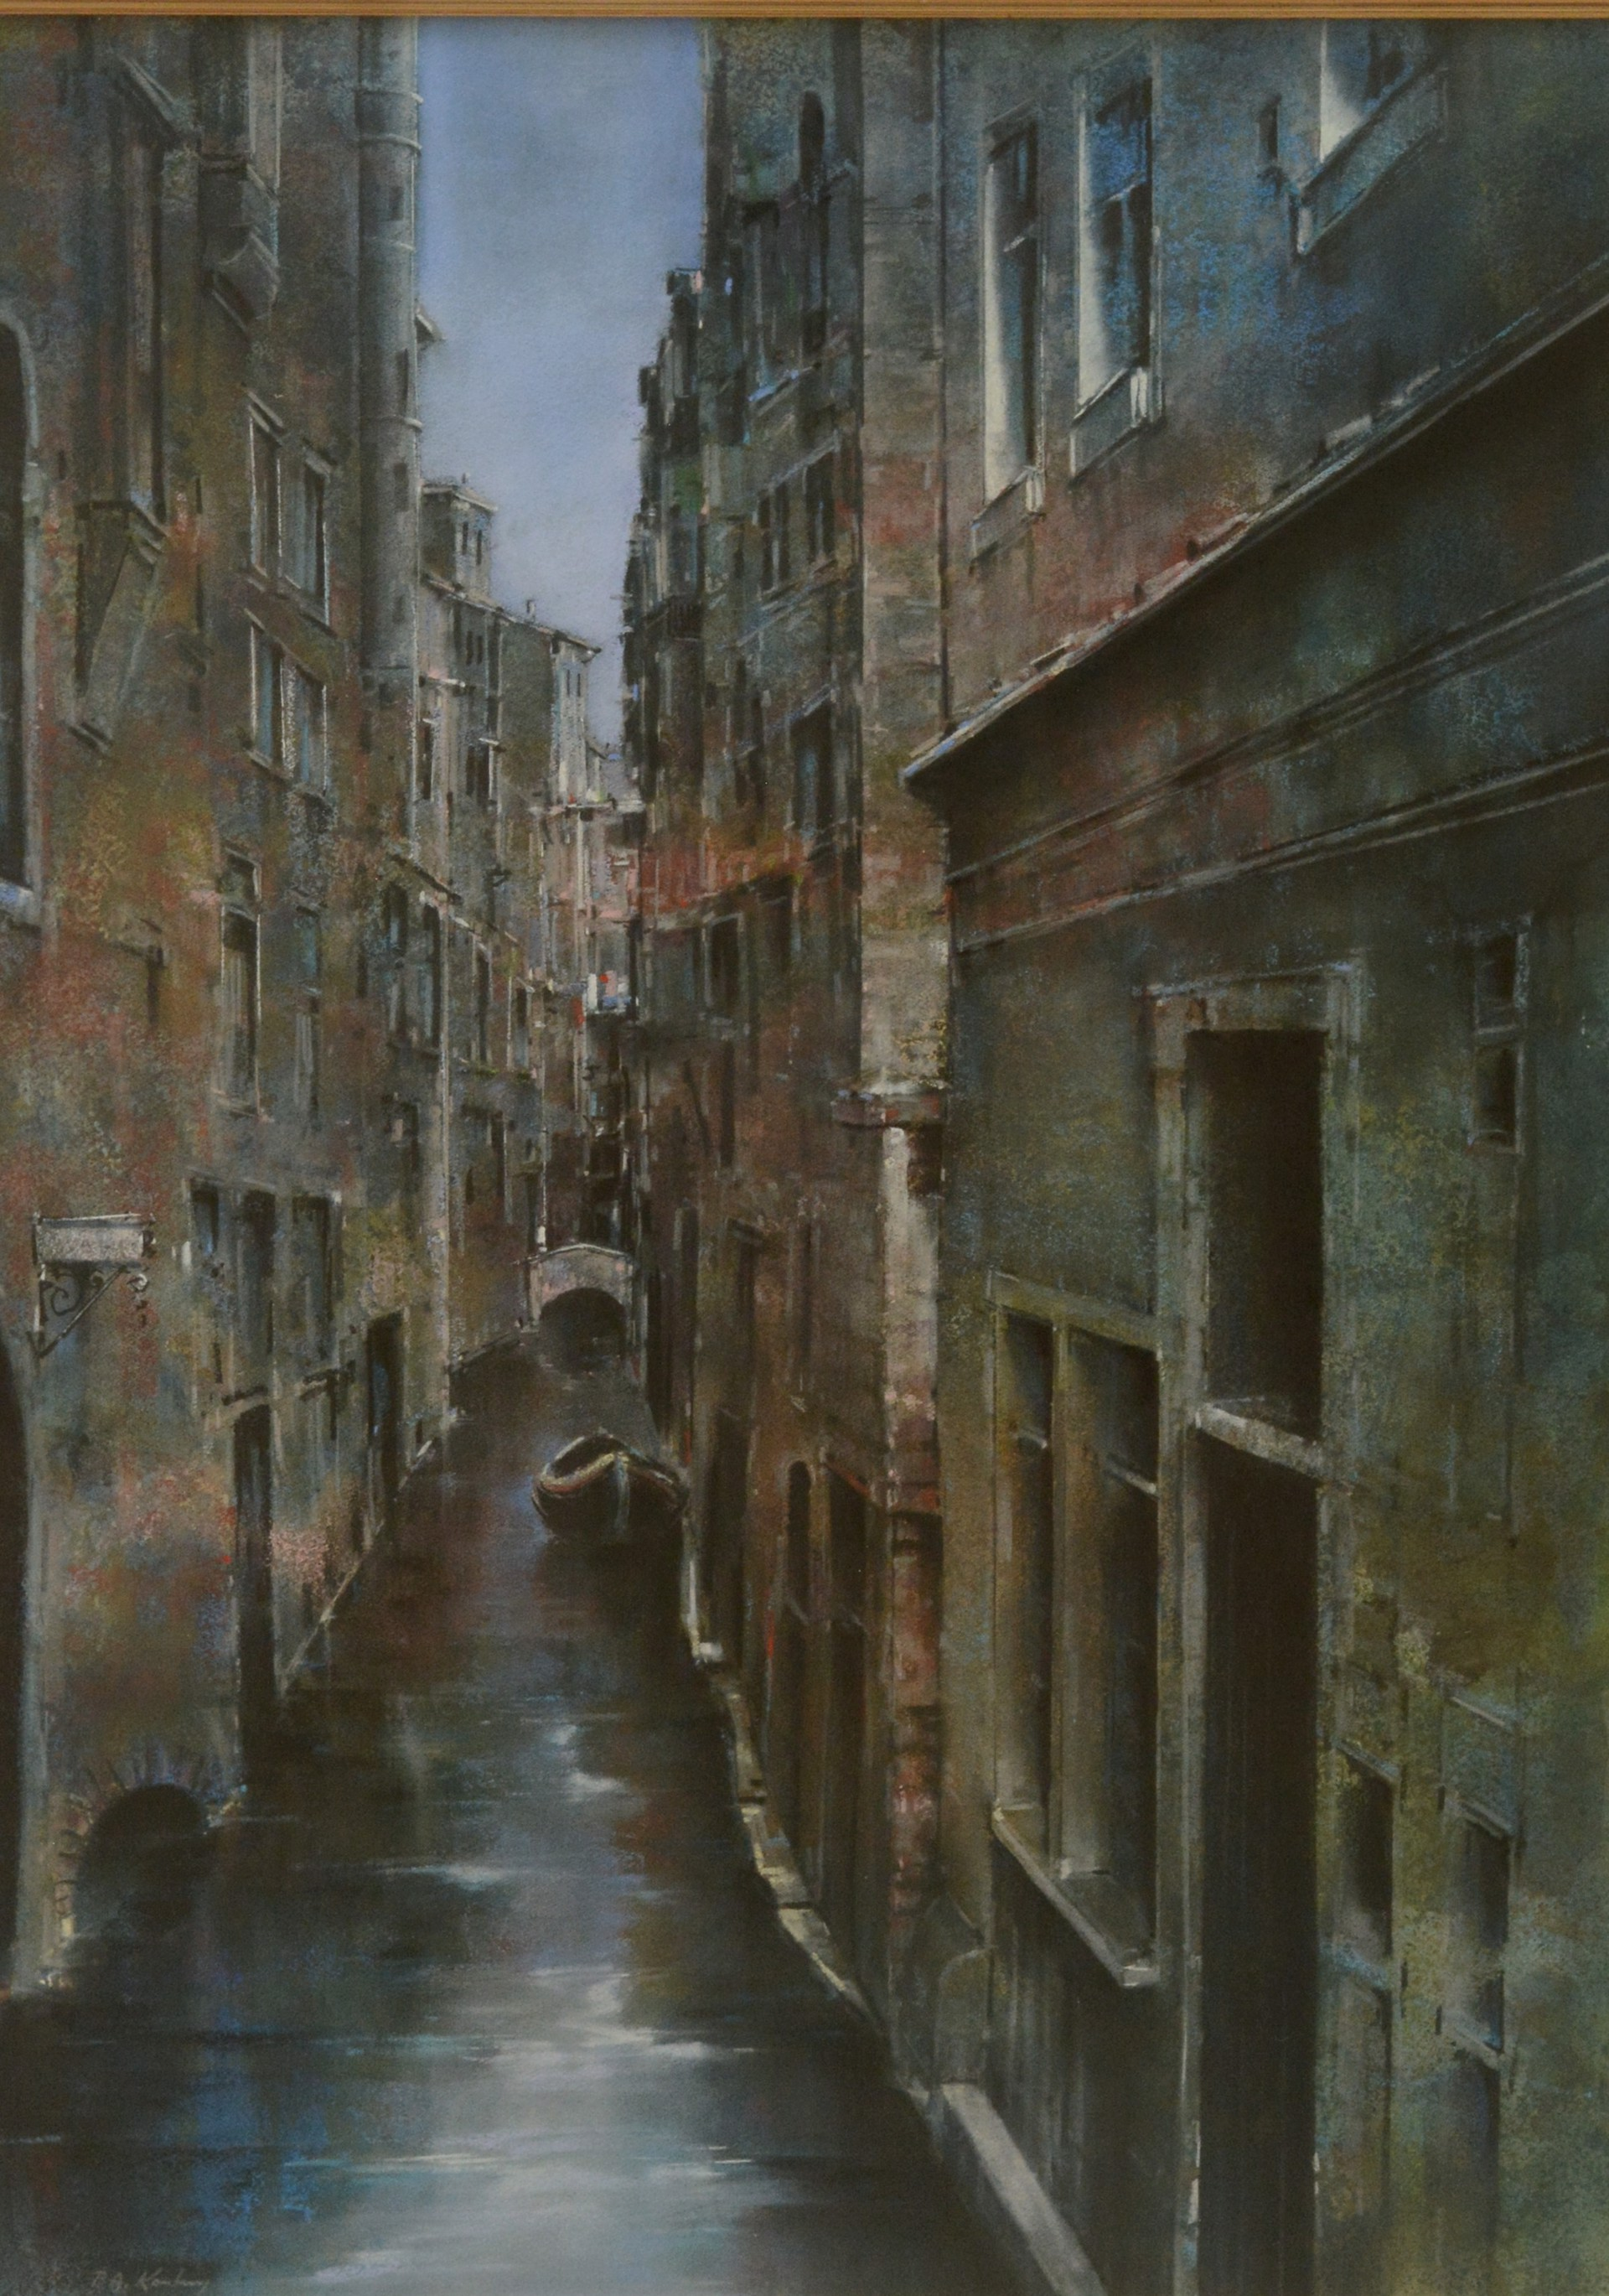 Venice by Pawel Kontny